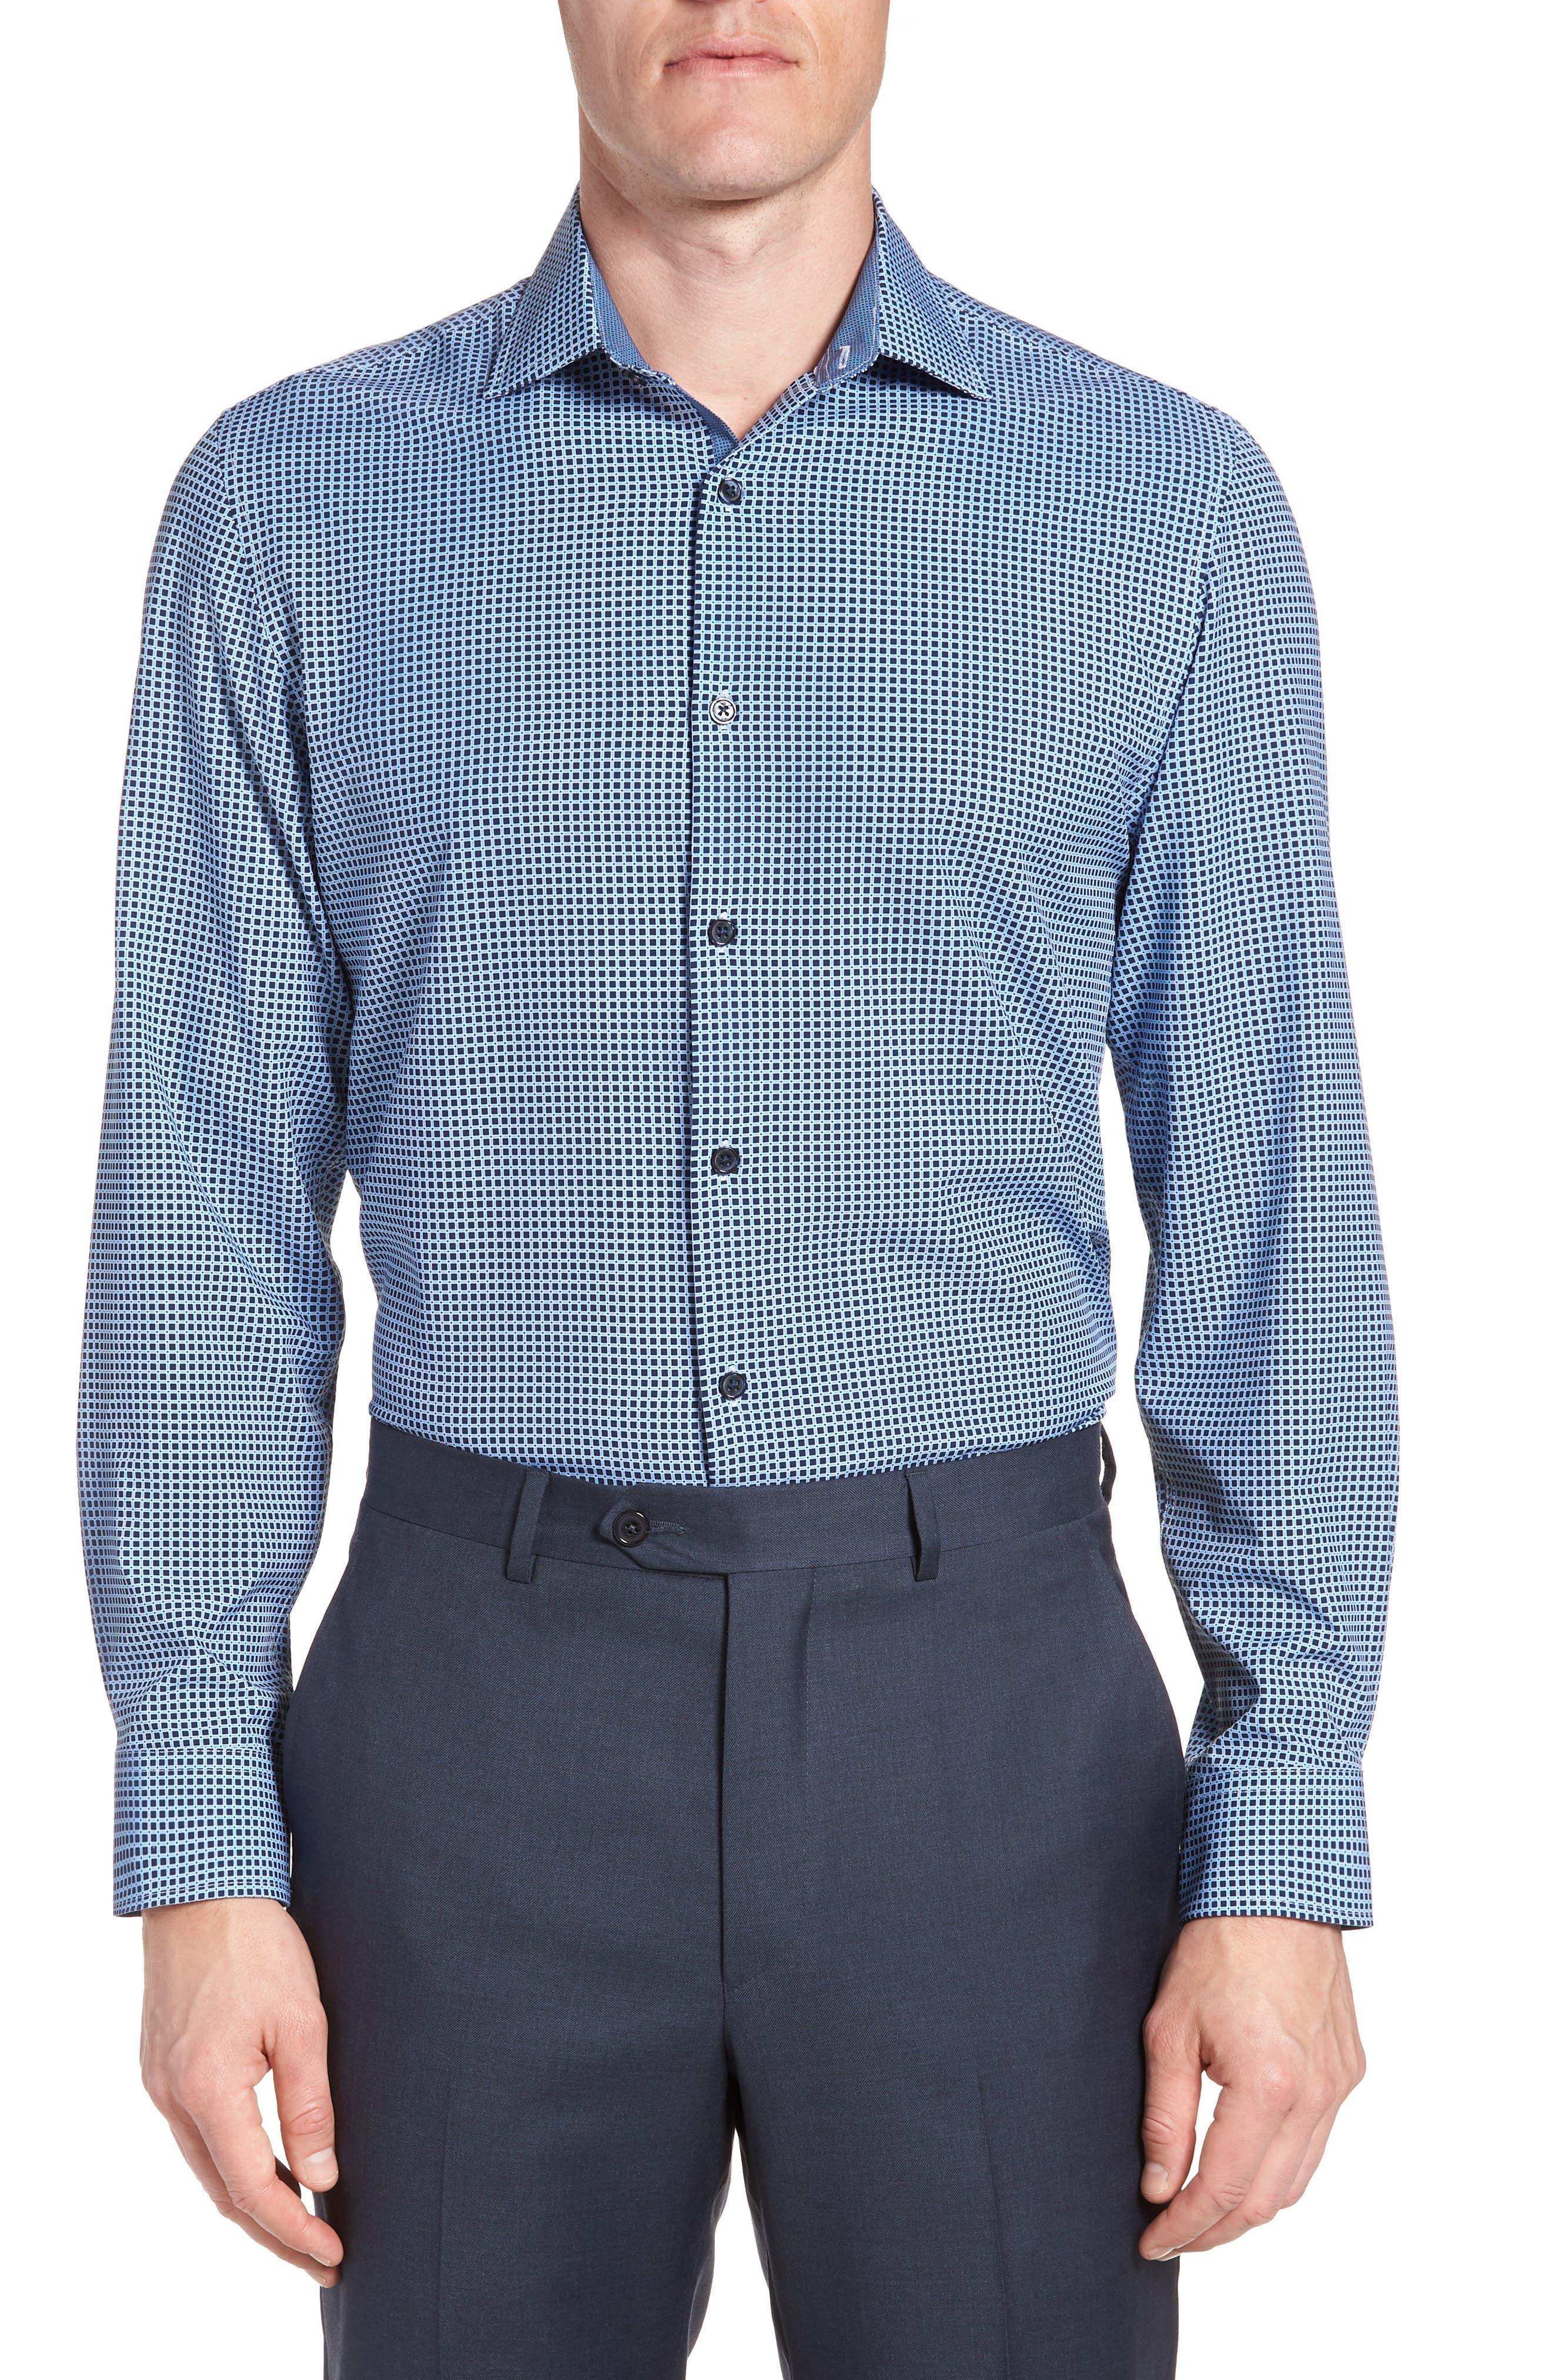 W.R.K Trim Fit Check 4-Way Stretch Dress Shirt, Main, color, 410